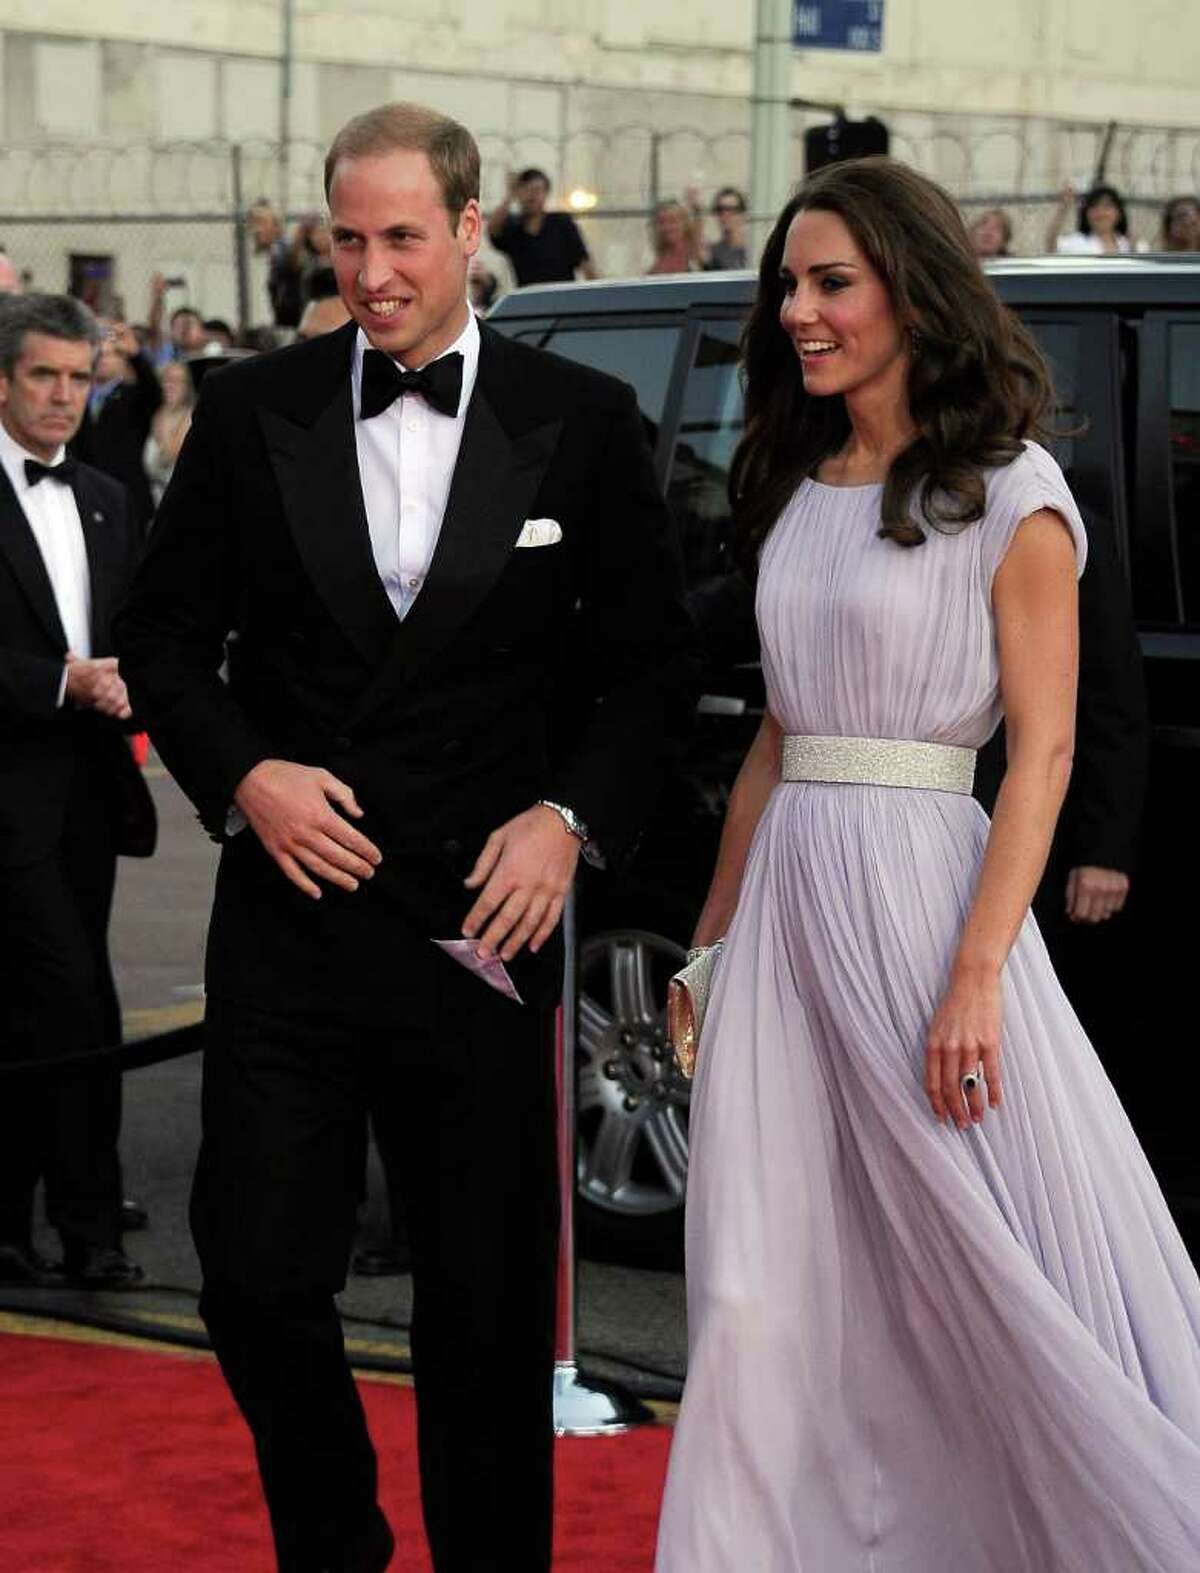 Prince William, Duke of Cambridge (L) and Catherine, Duchess of Cambridge arrive.